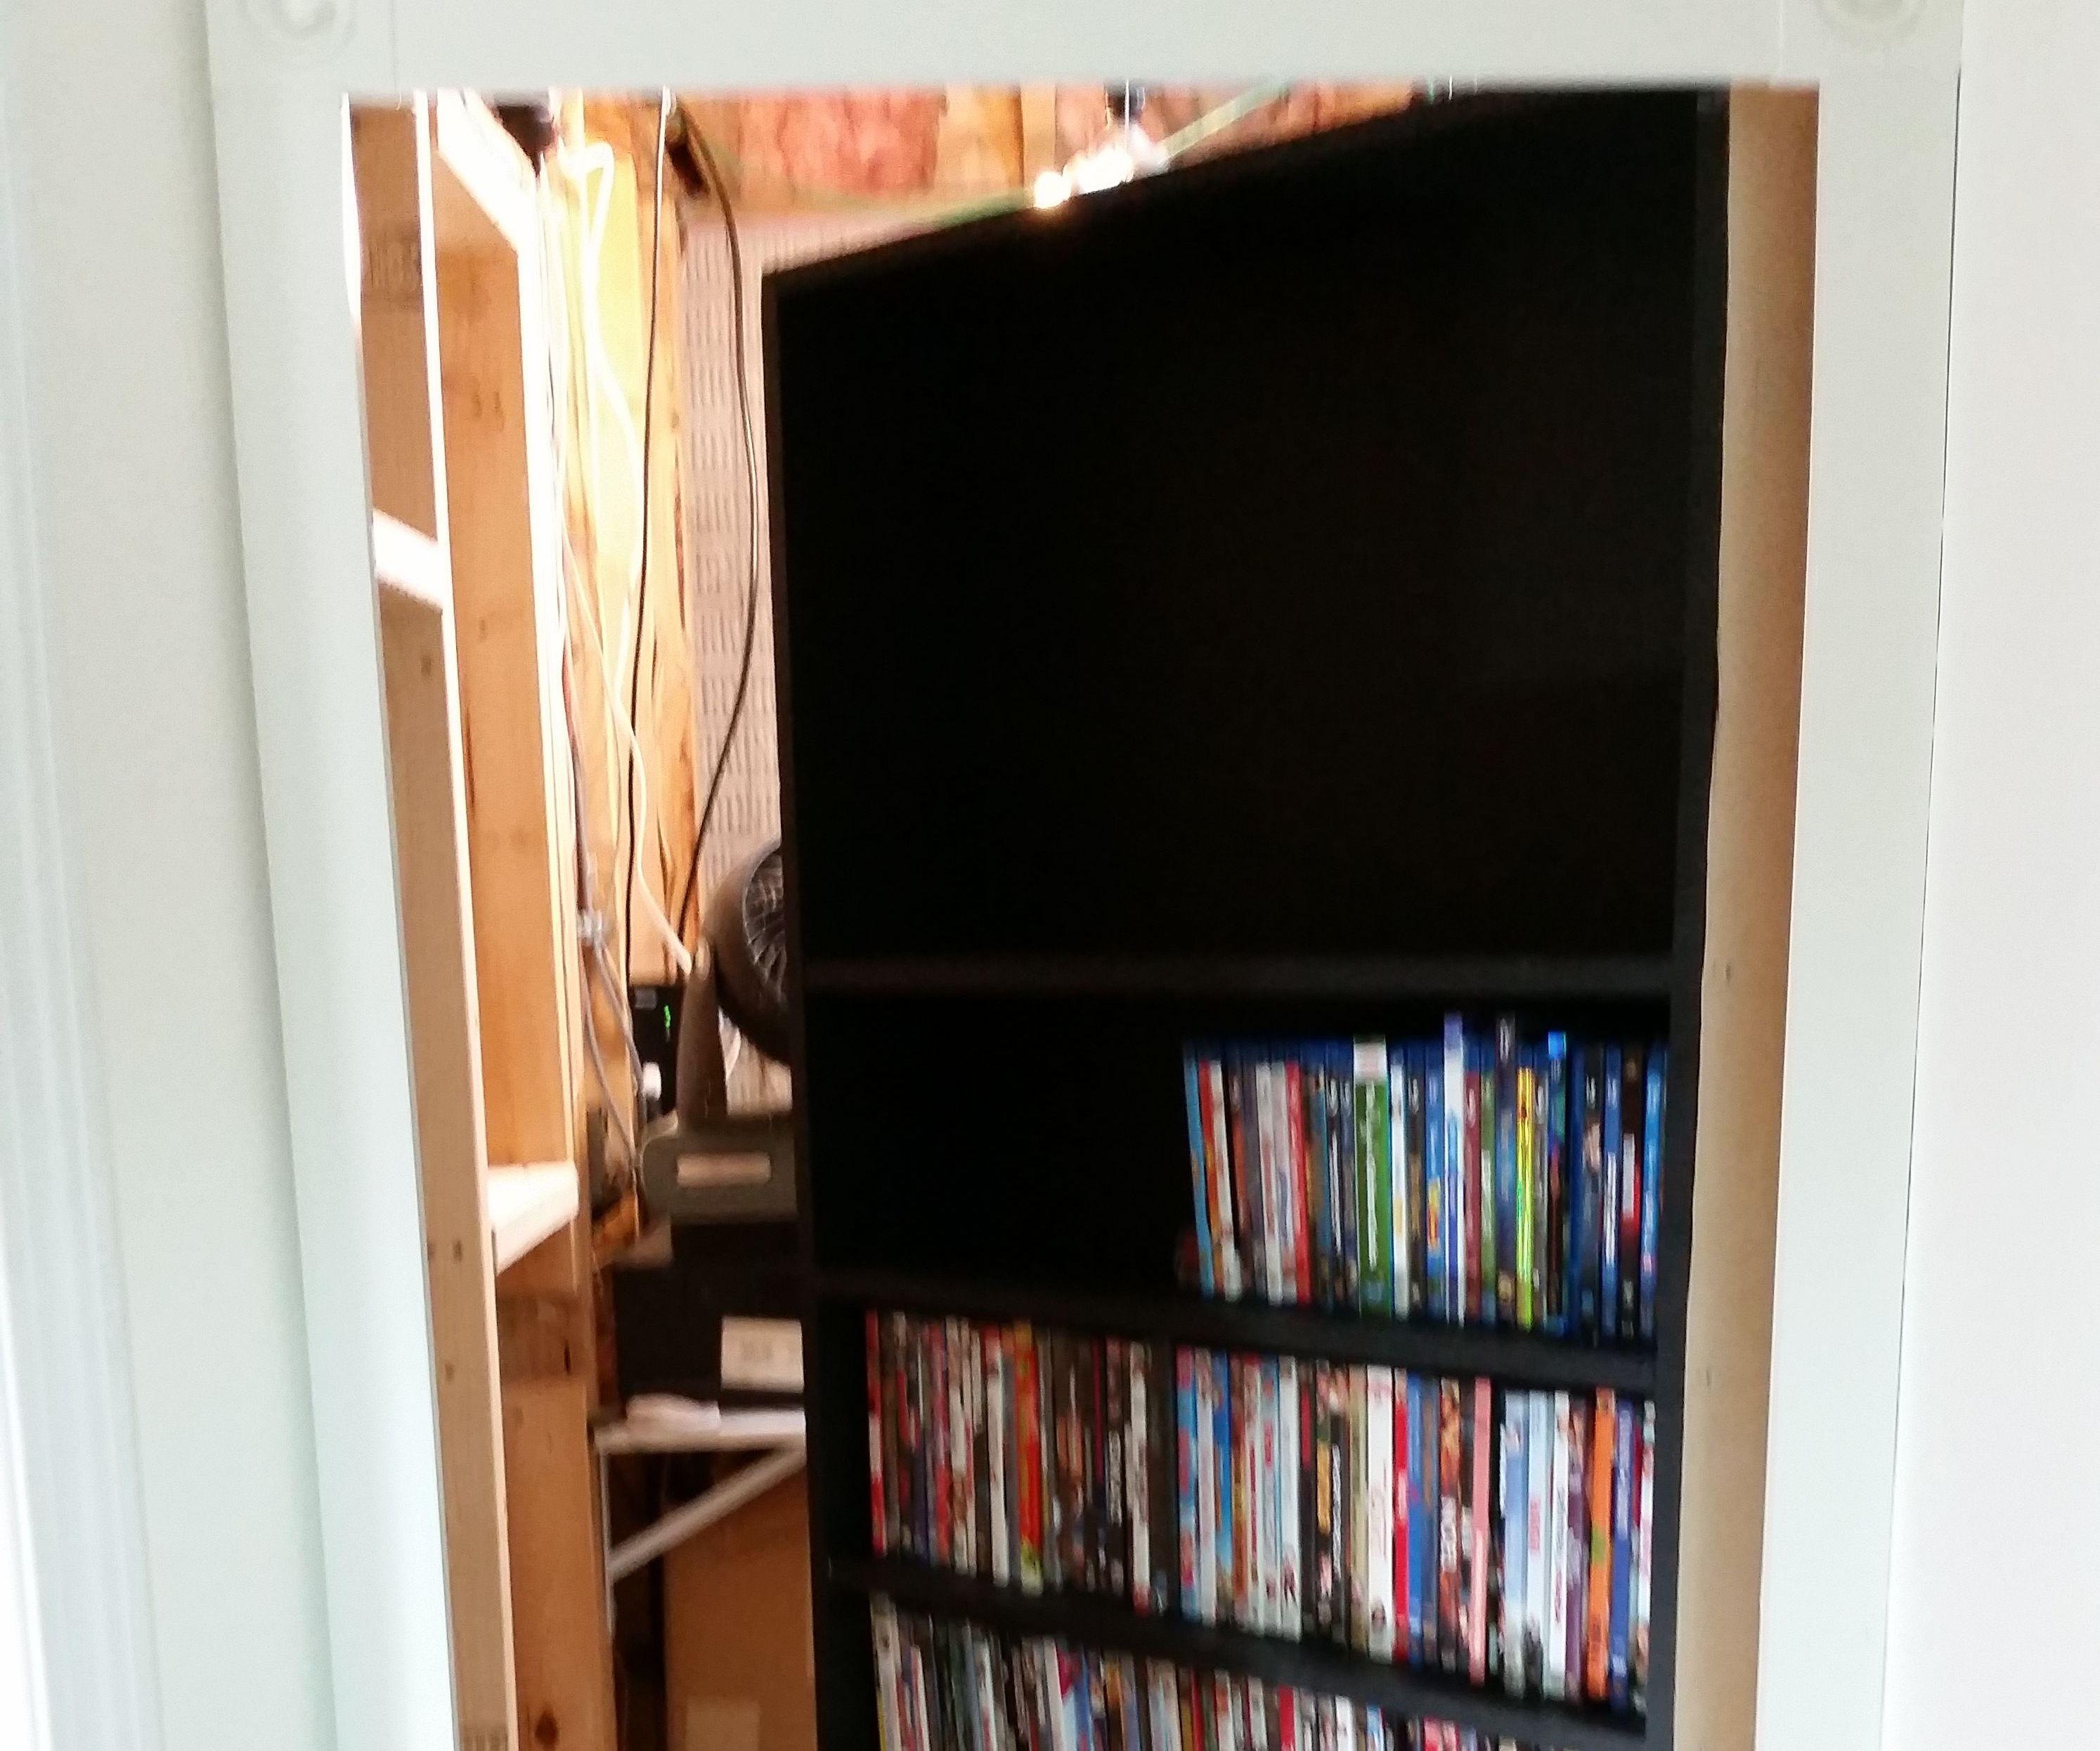 Secret DVD/Bookcase Door: 7 Steps (with Pictures)